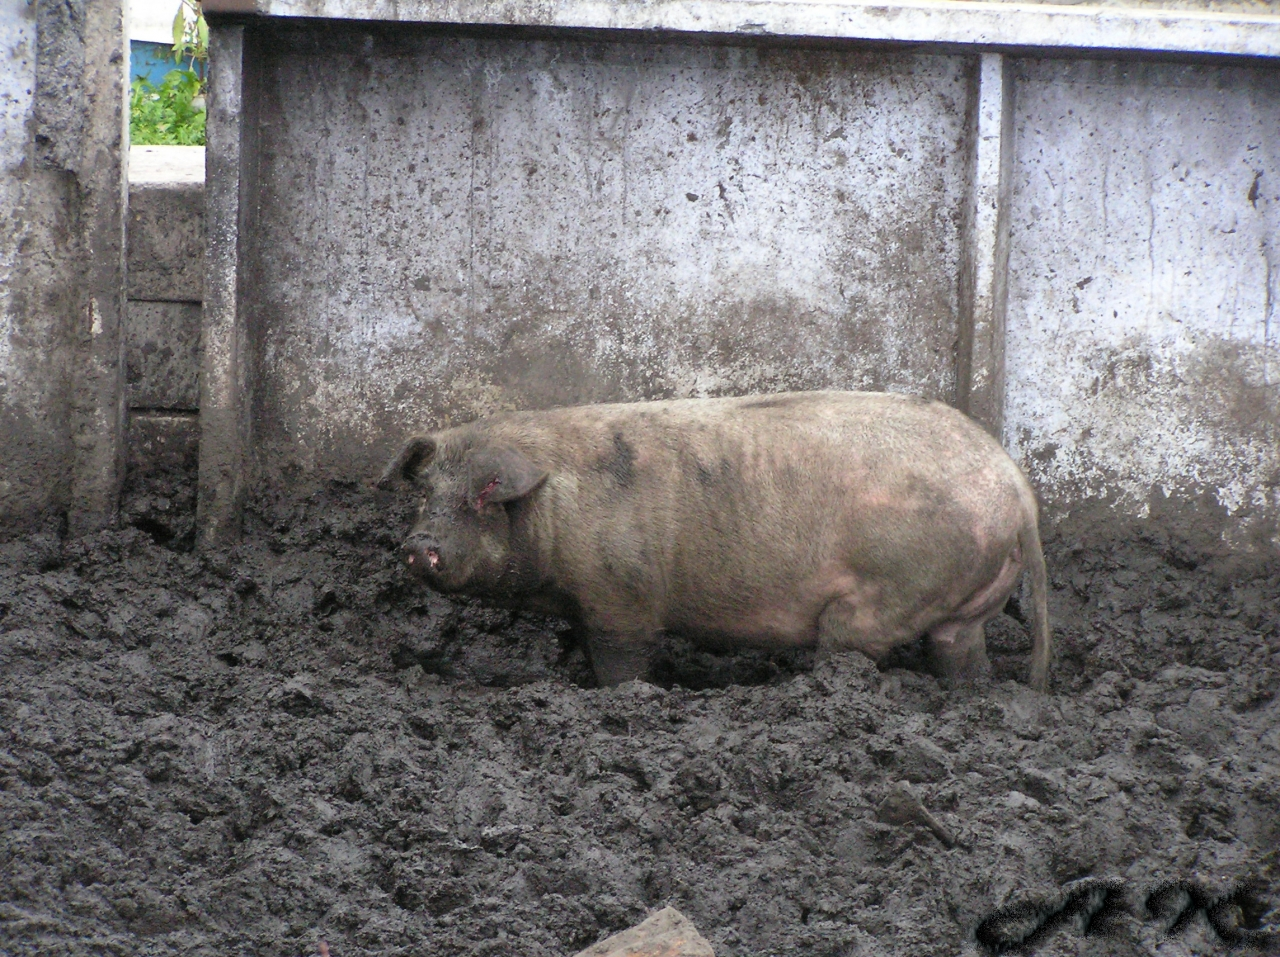 sakh-wolf: -Сам свинья!